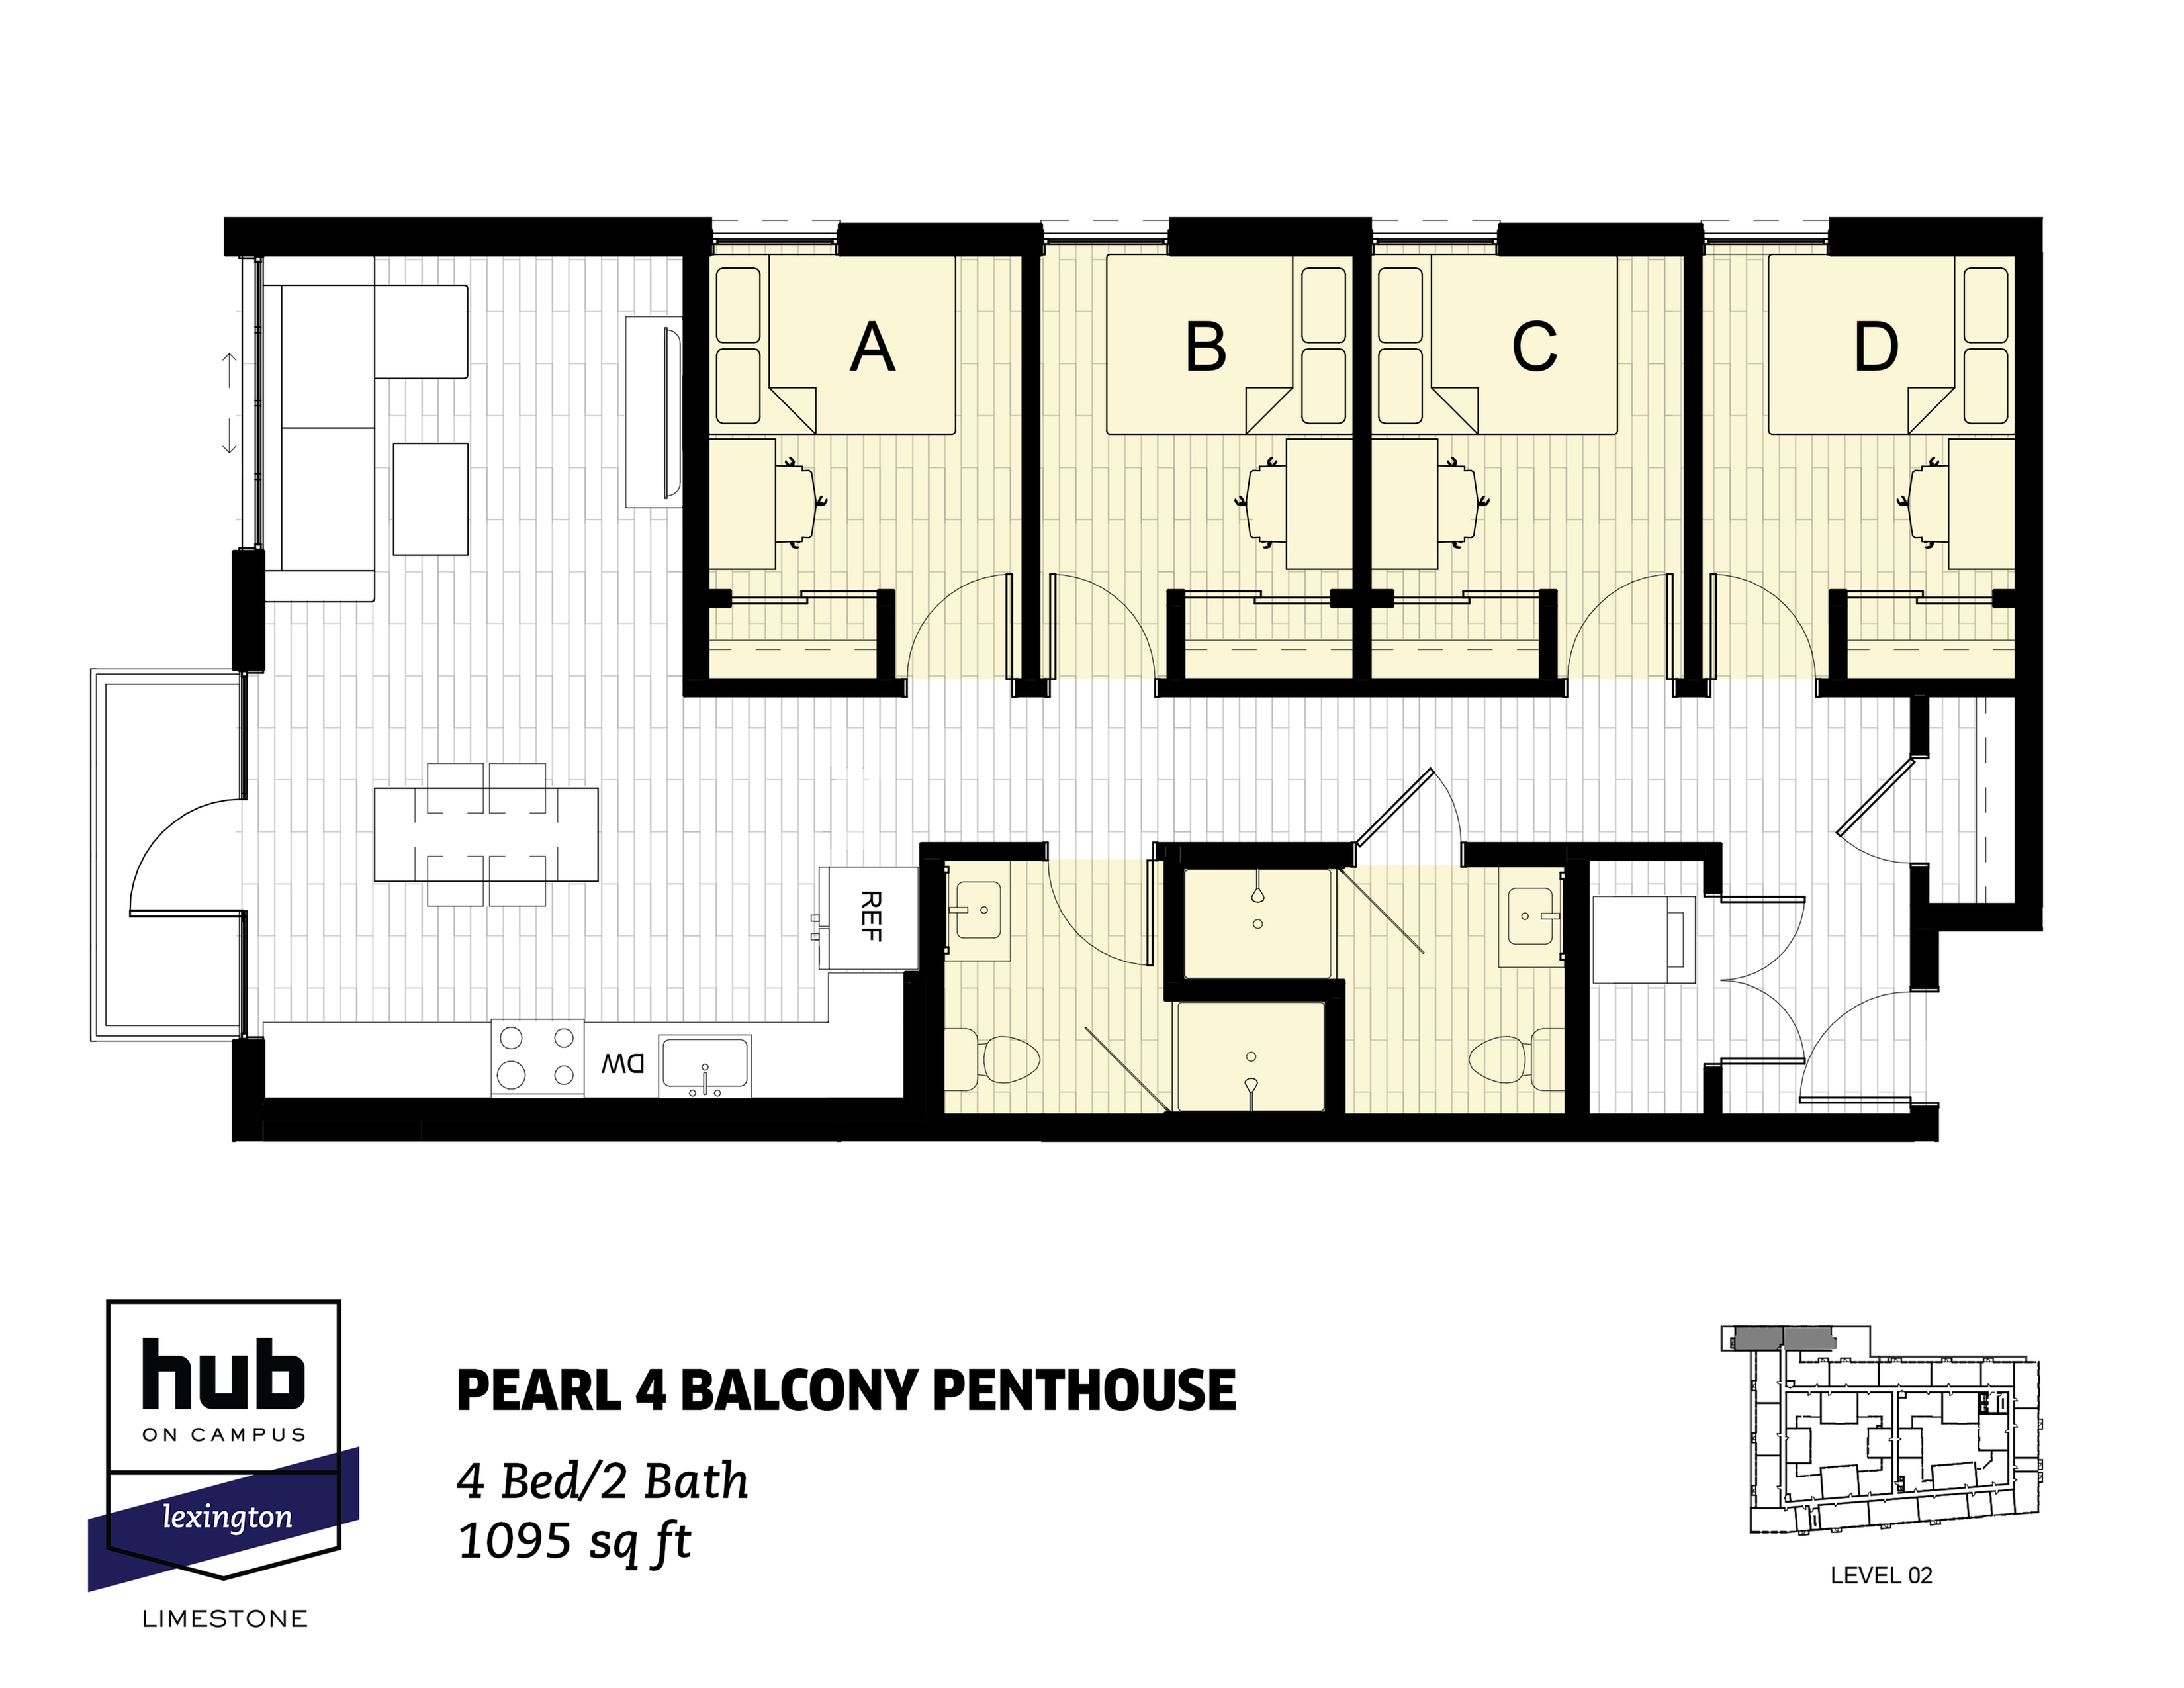 Pearl 4 Balcony Penthouse